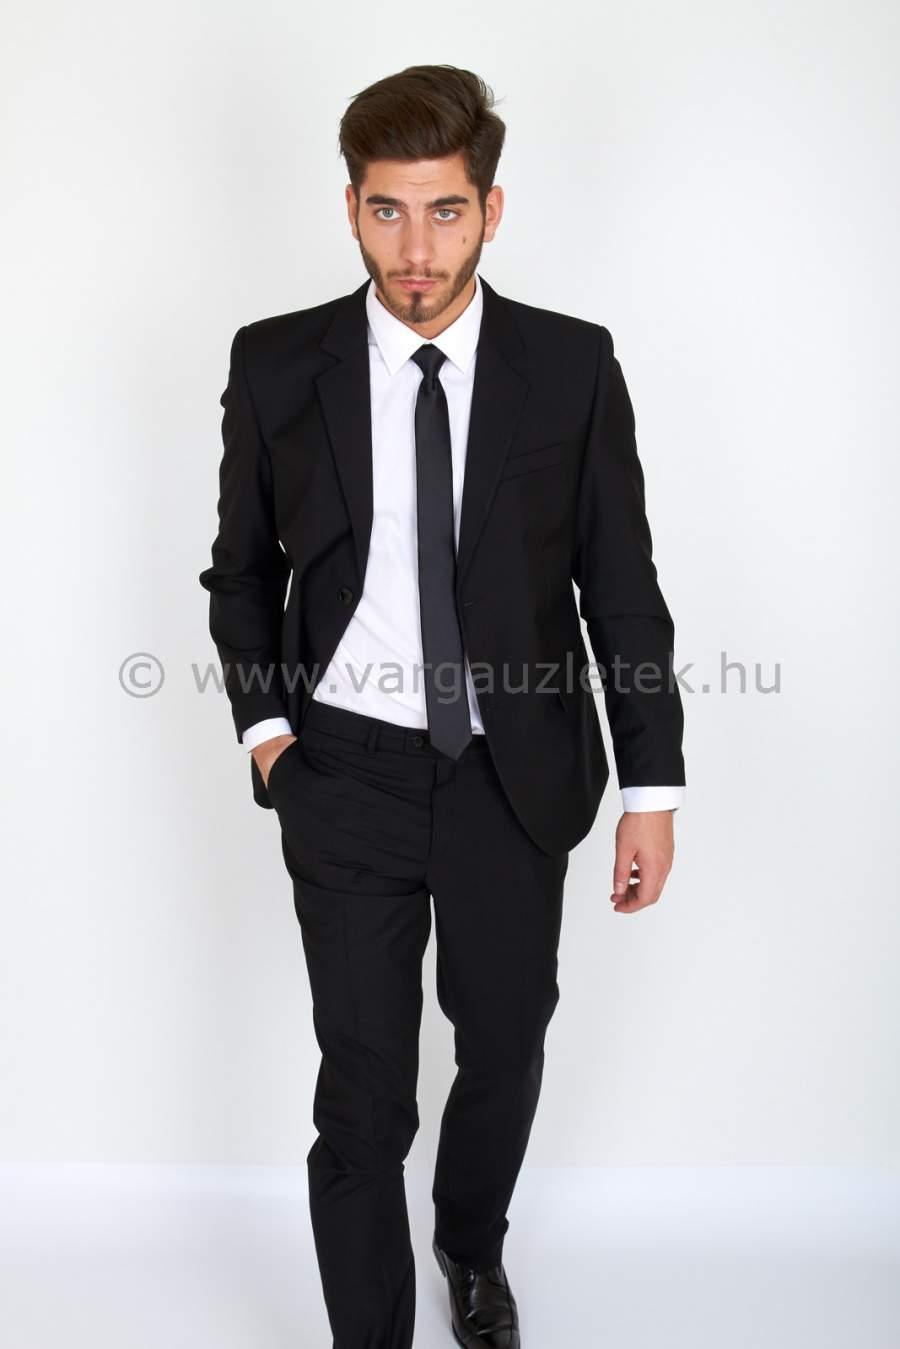 Fekete SLIM öltöny